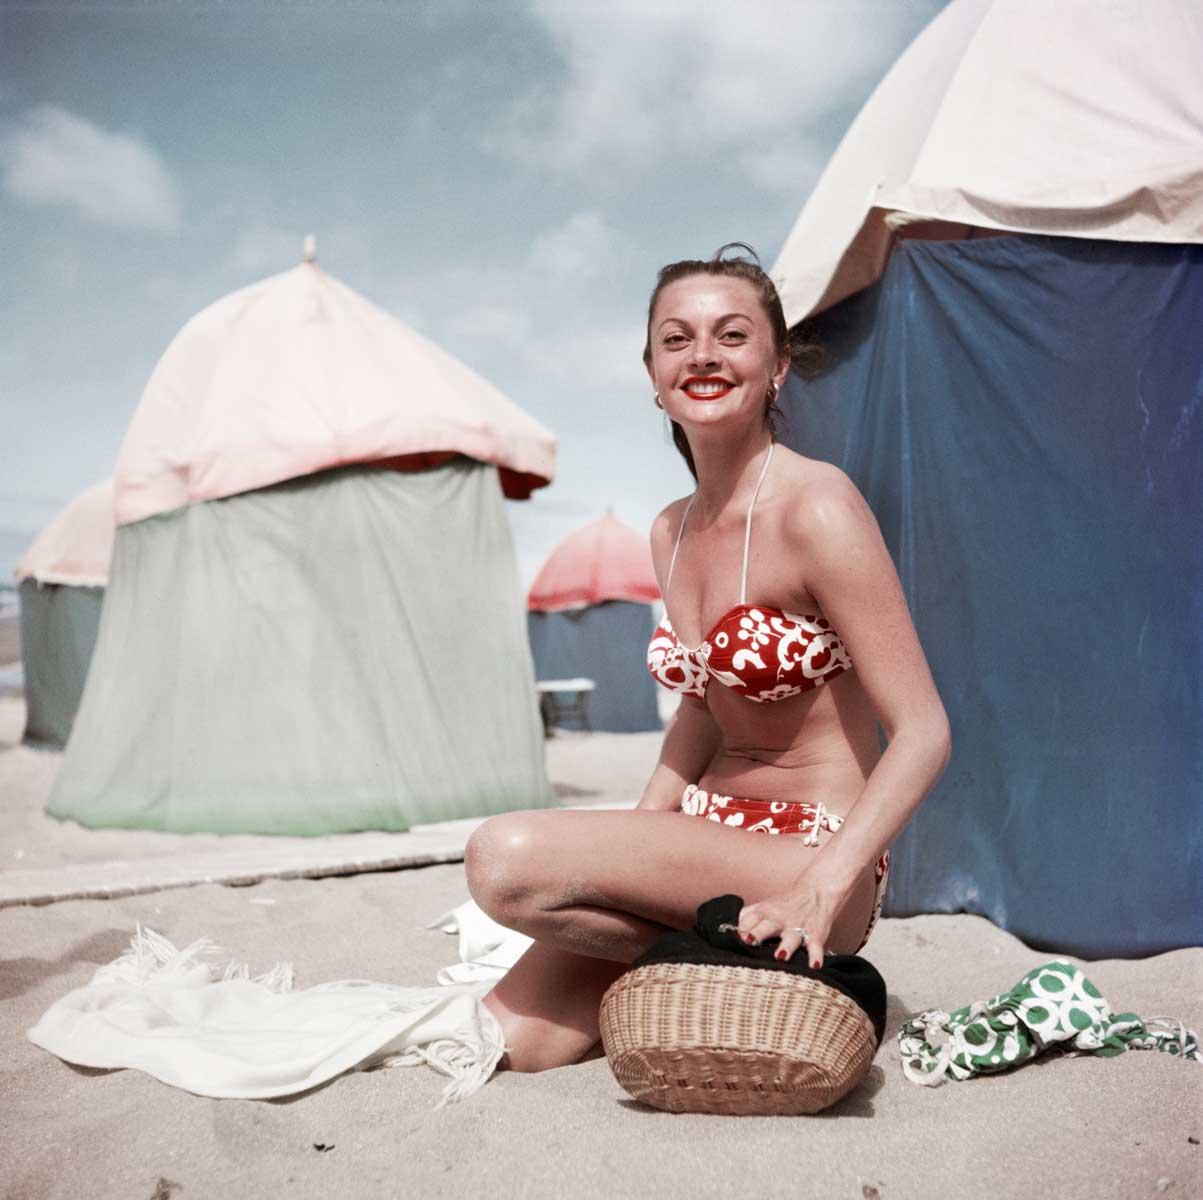 Woman in a bikini, Deauville, France, Aug. 1951.